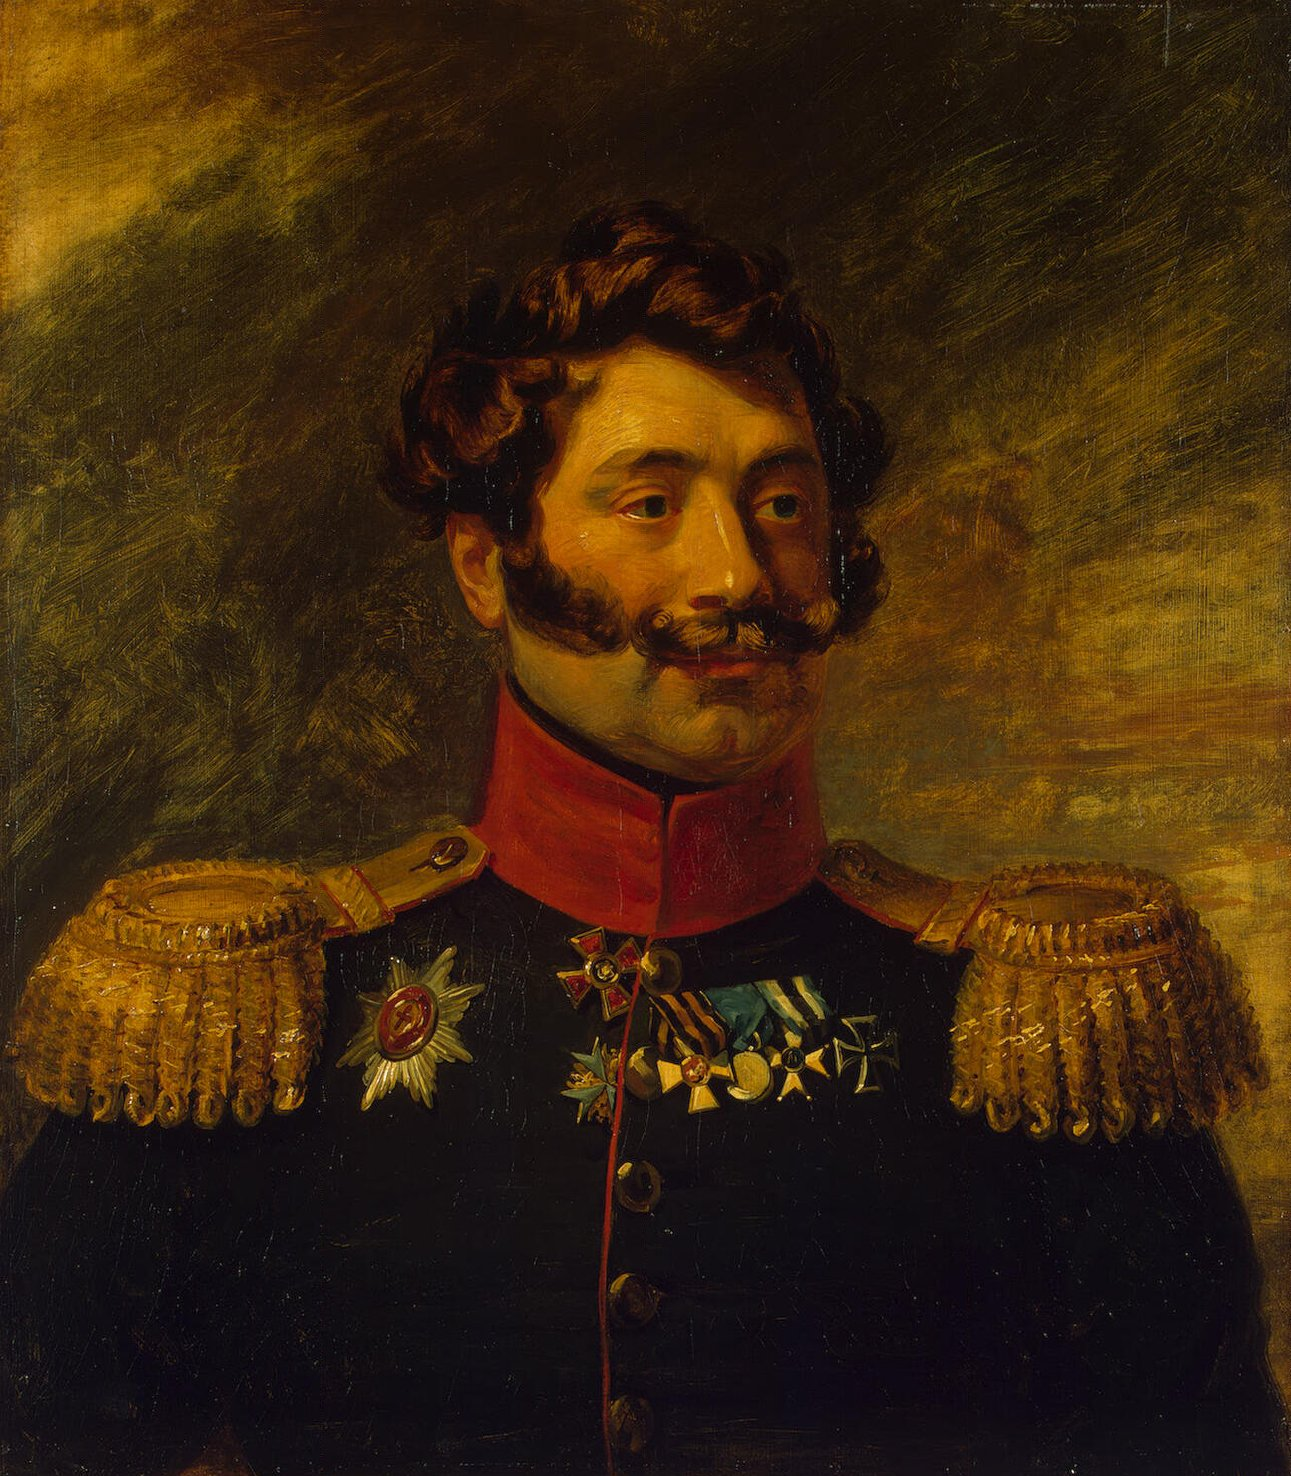 Хилков, Степан Александрович